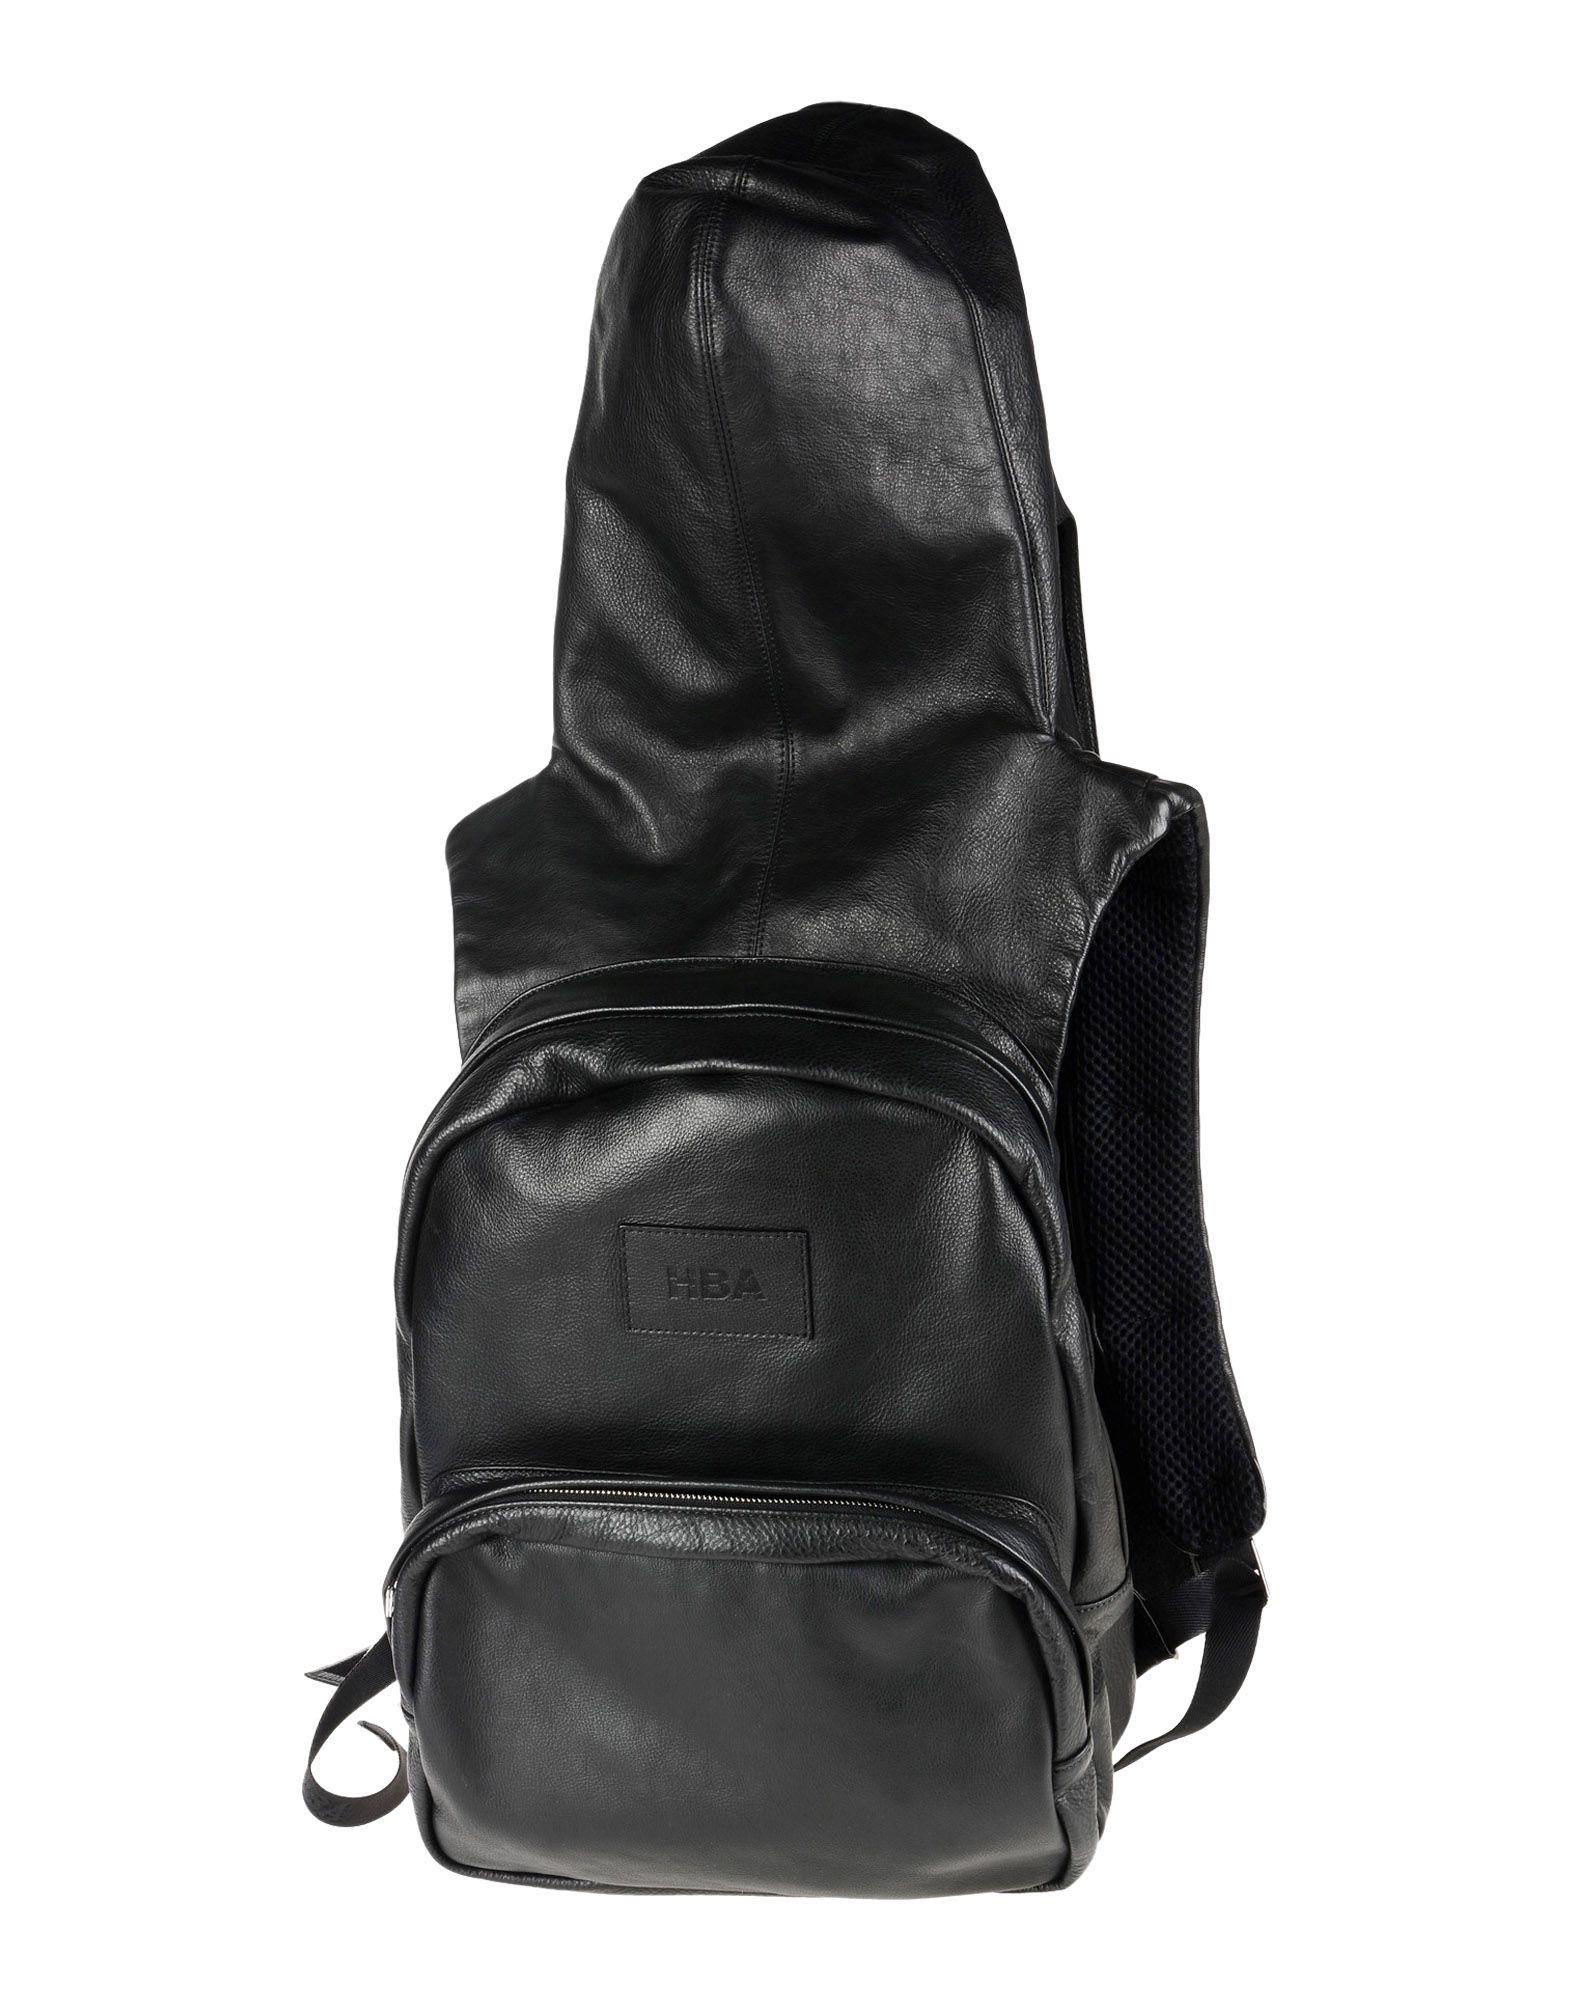 HBA HOOD BY AIR Рюкзаки и сумки на пояс 2 piece set locking hood look catch hood latches kit for jeep wrangler jk rubicon sahara unlimited 2007 2016